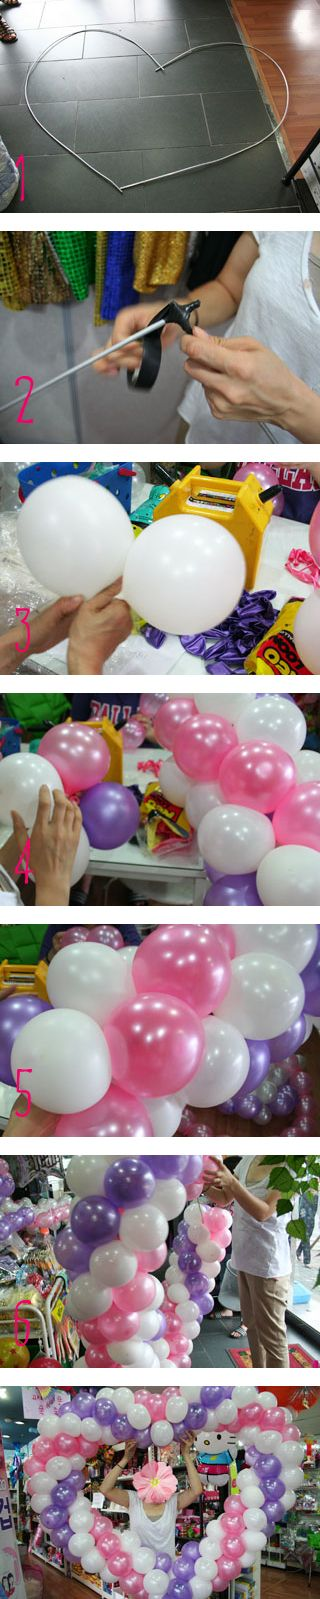 DIY Love heart balloon decoration